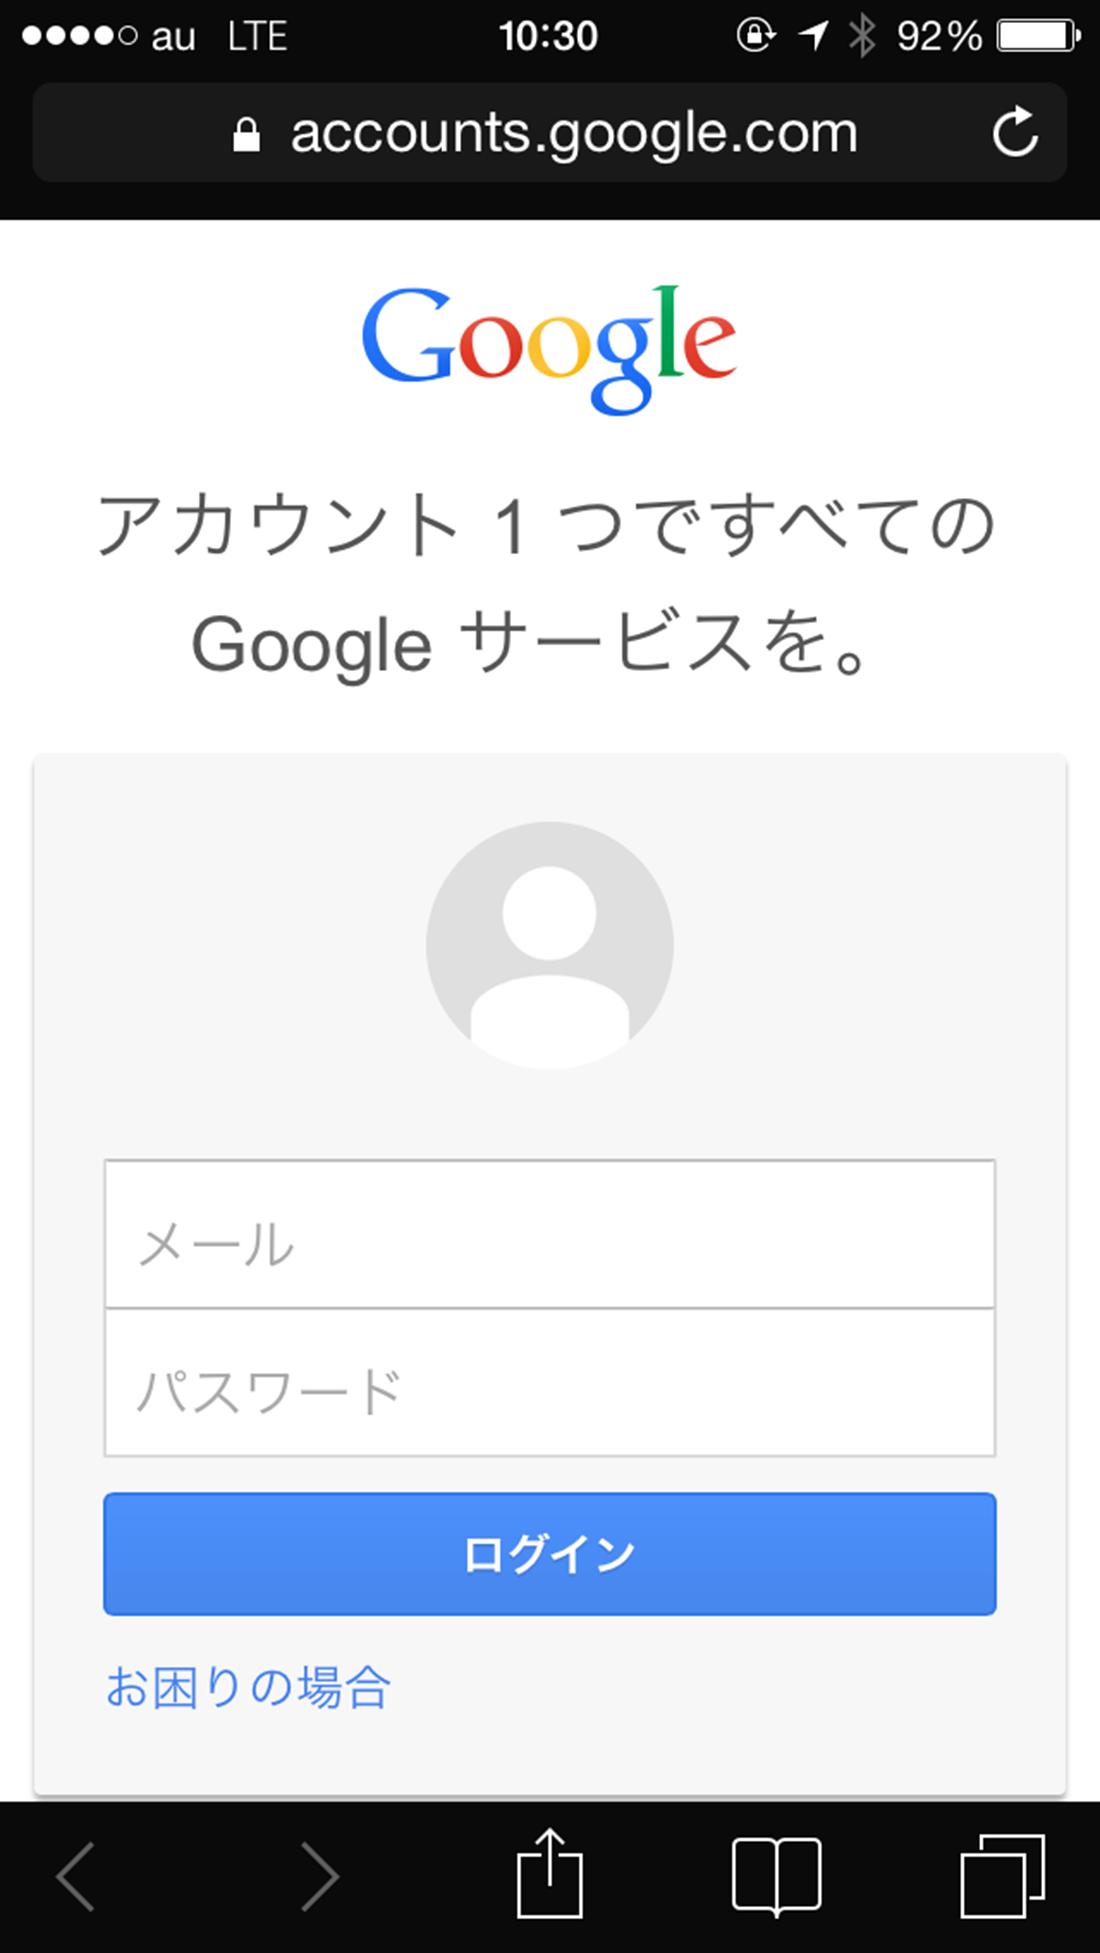 iCloud-key-chain-Google